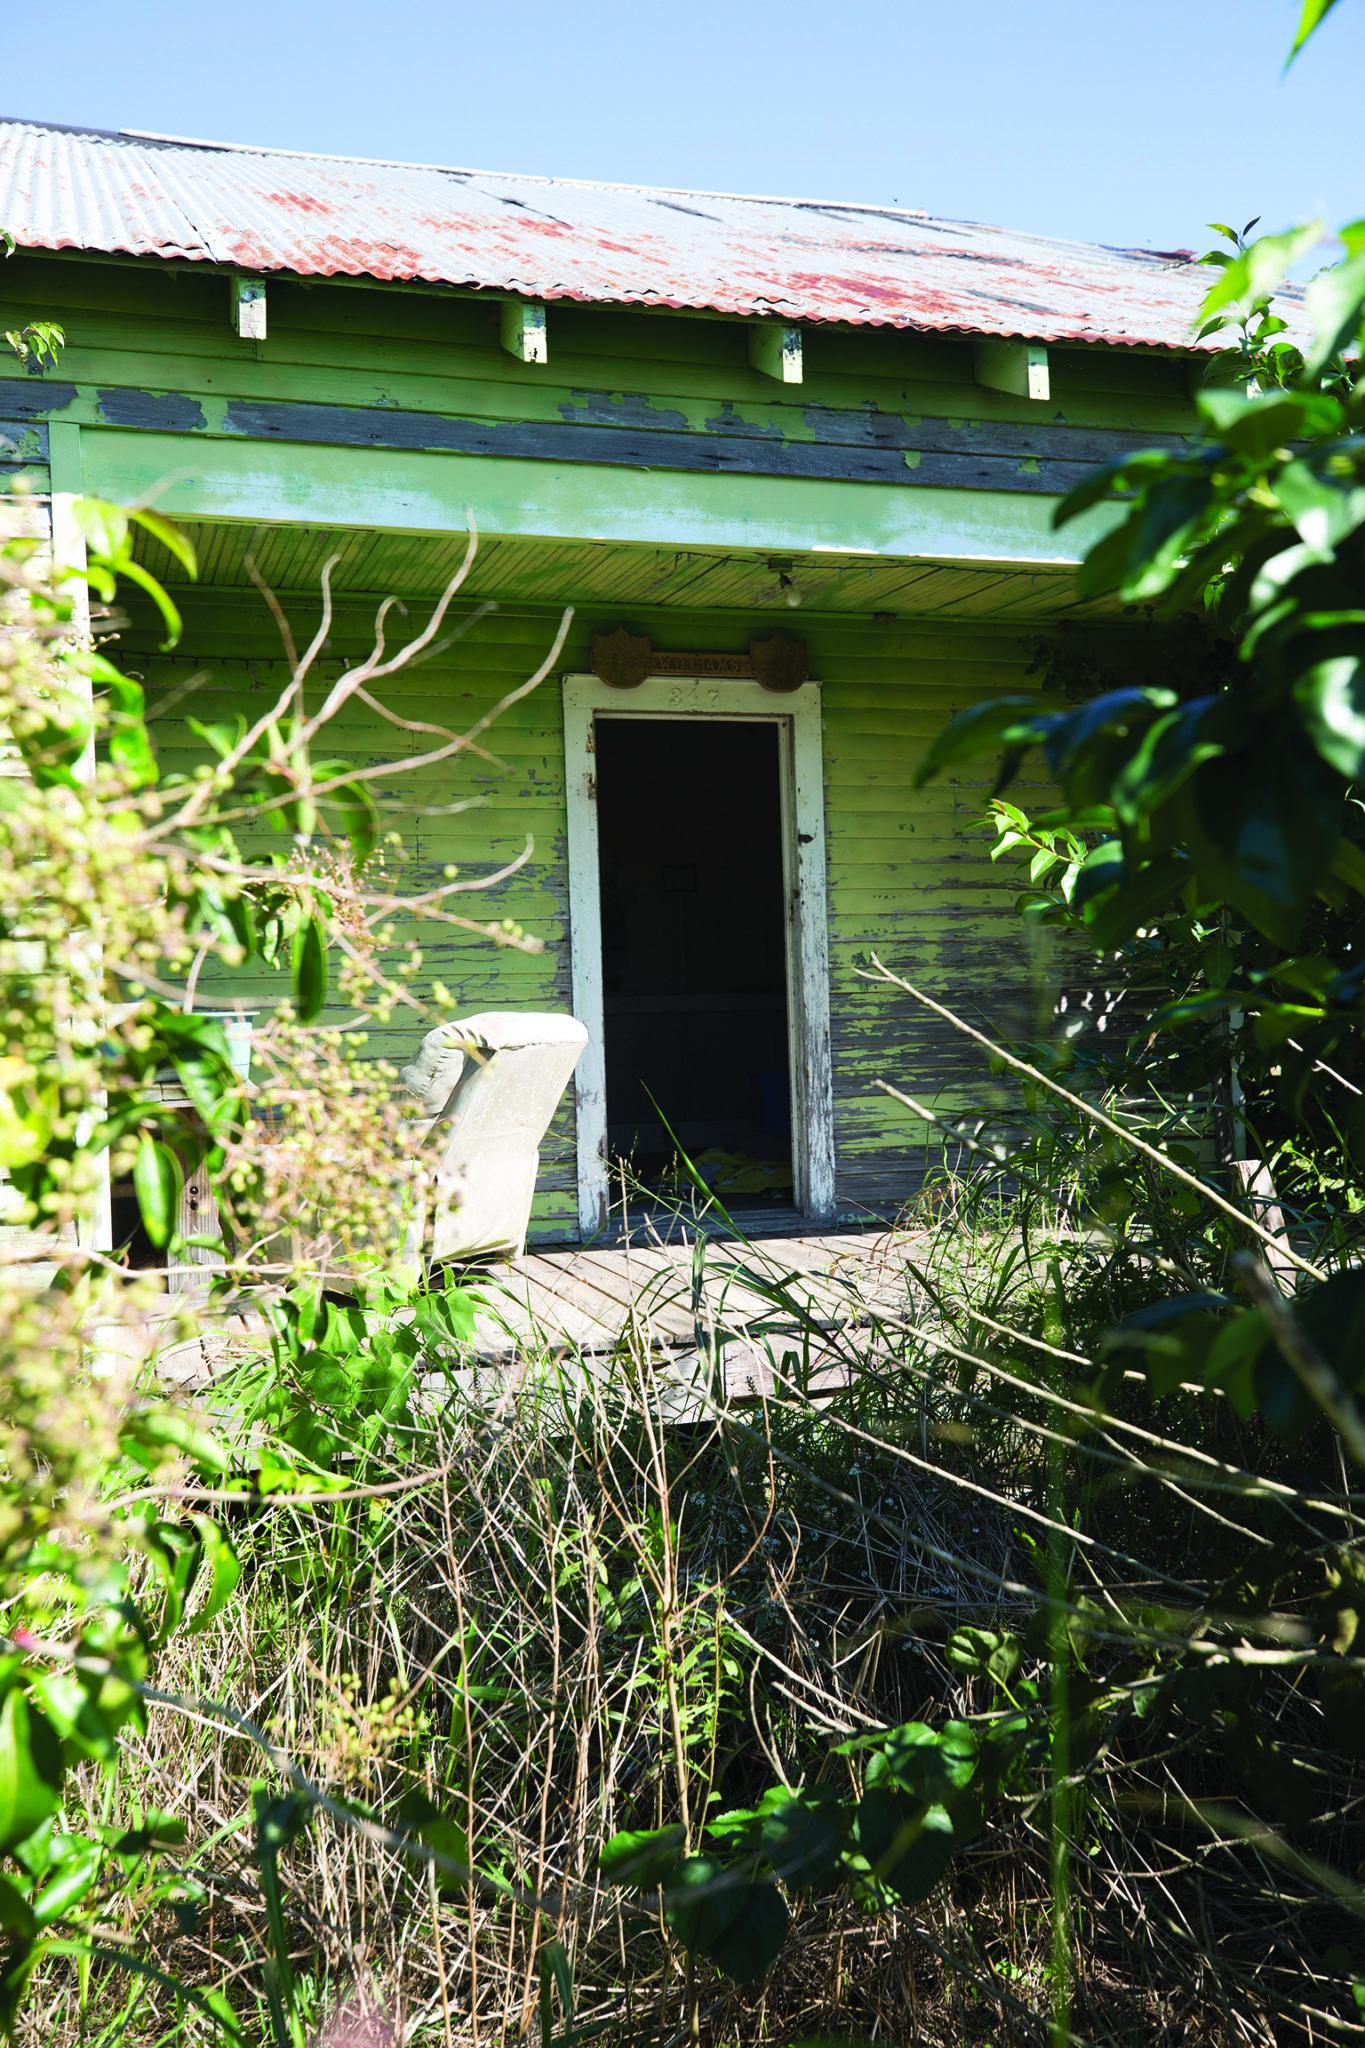 10-27-2018-sugar-cane-story-day-5-746.jpg